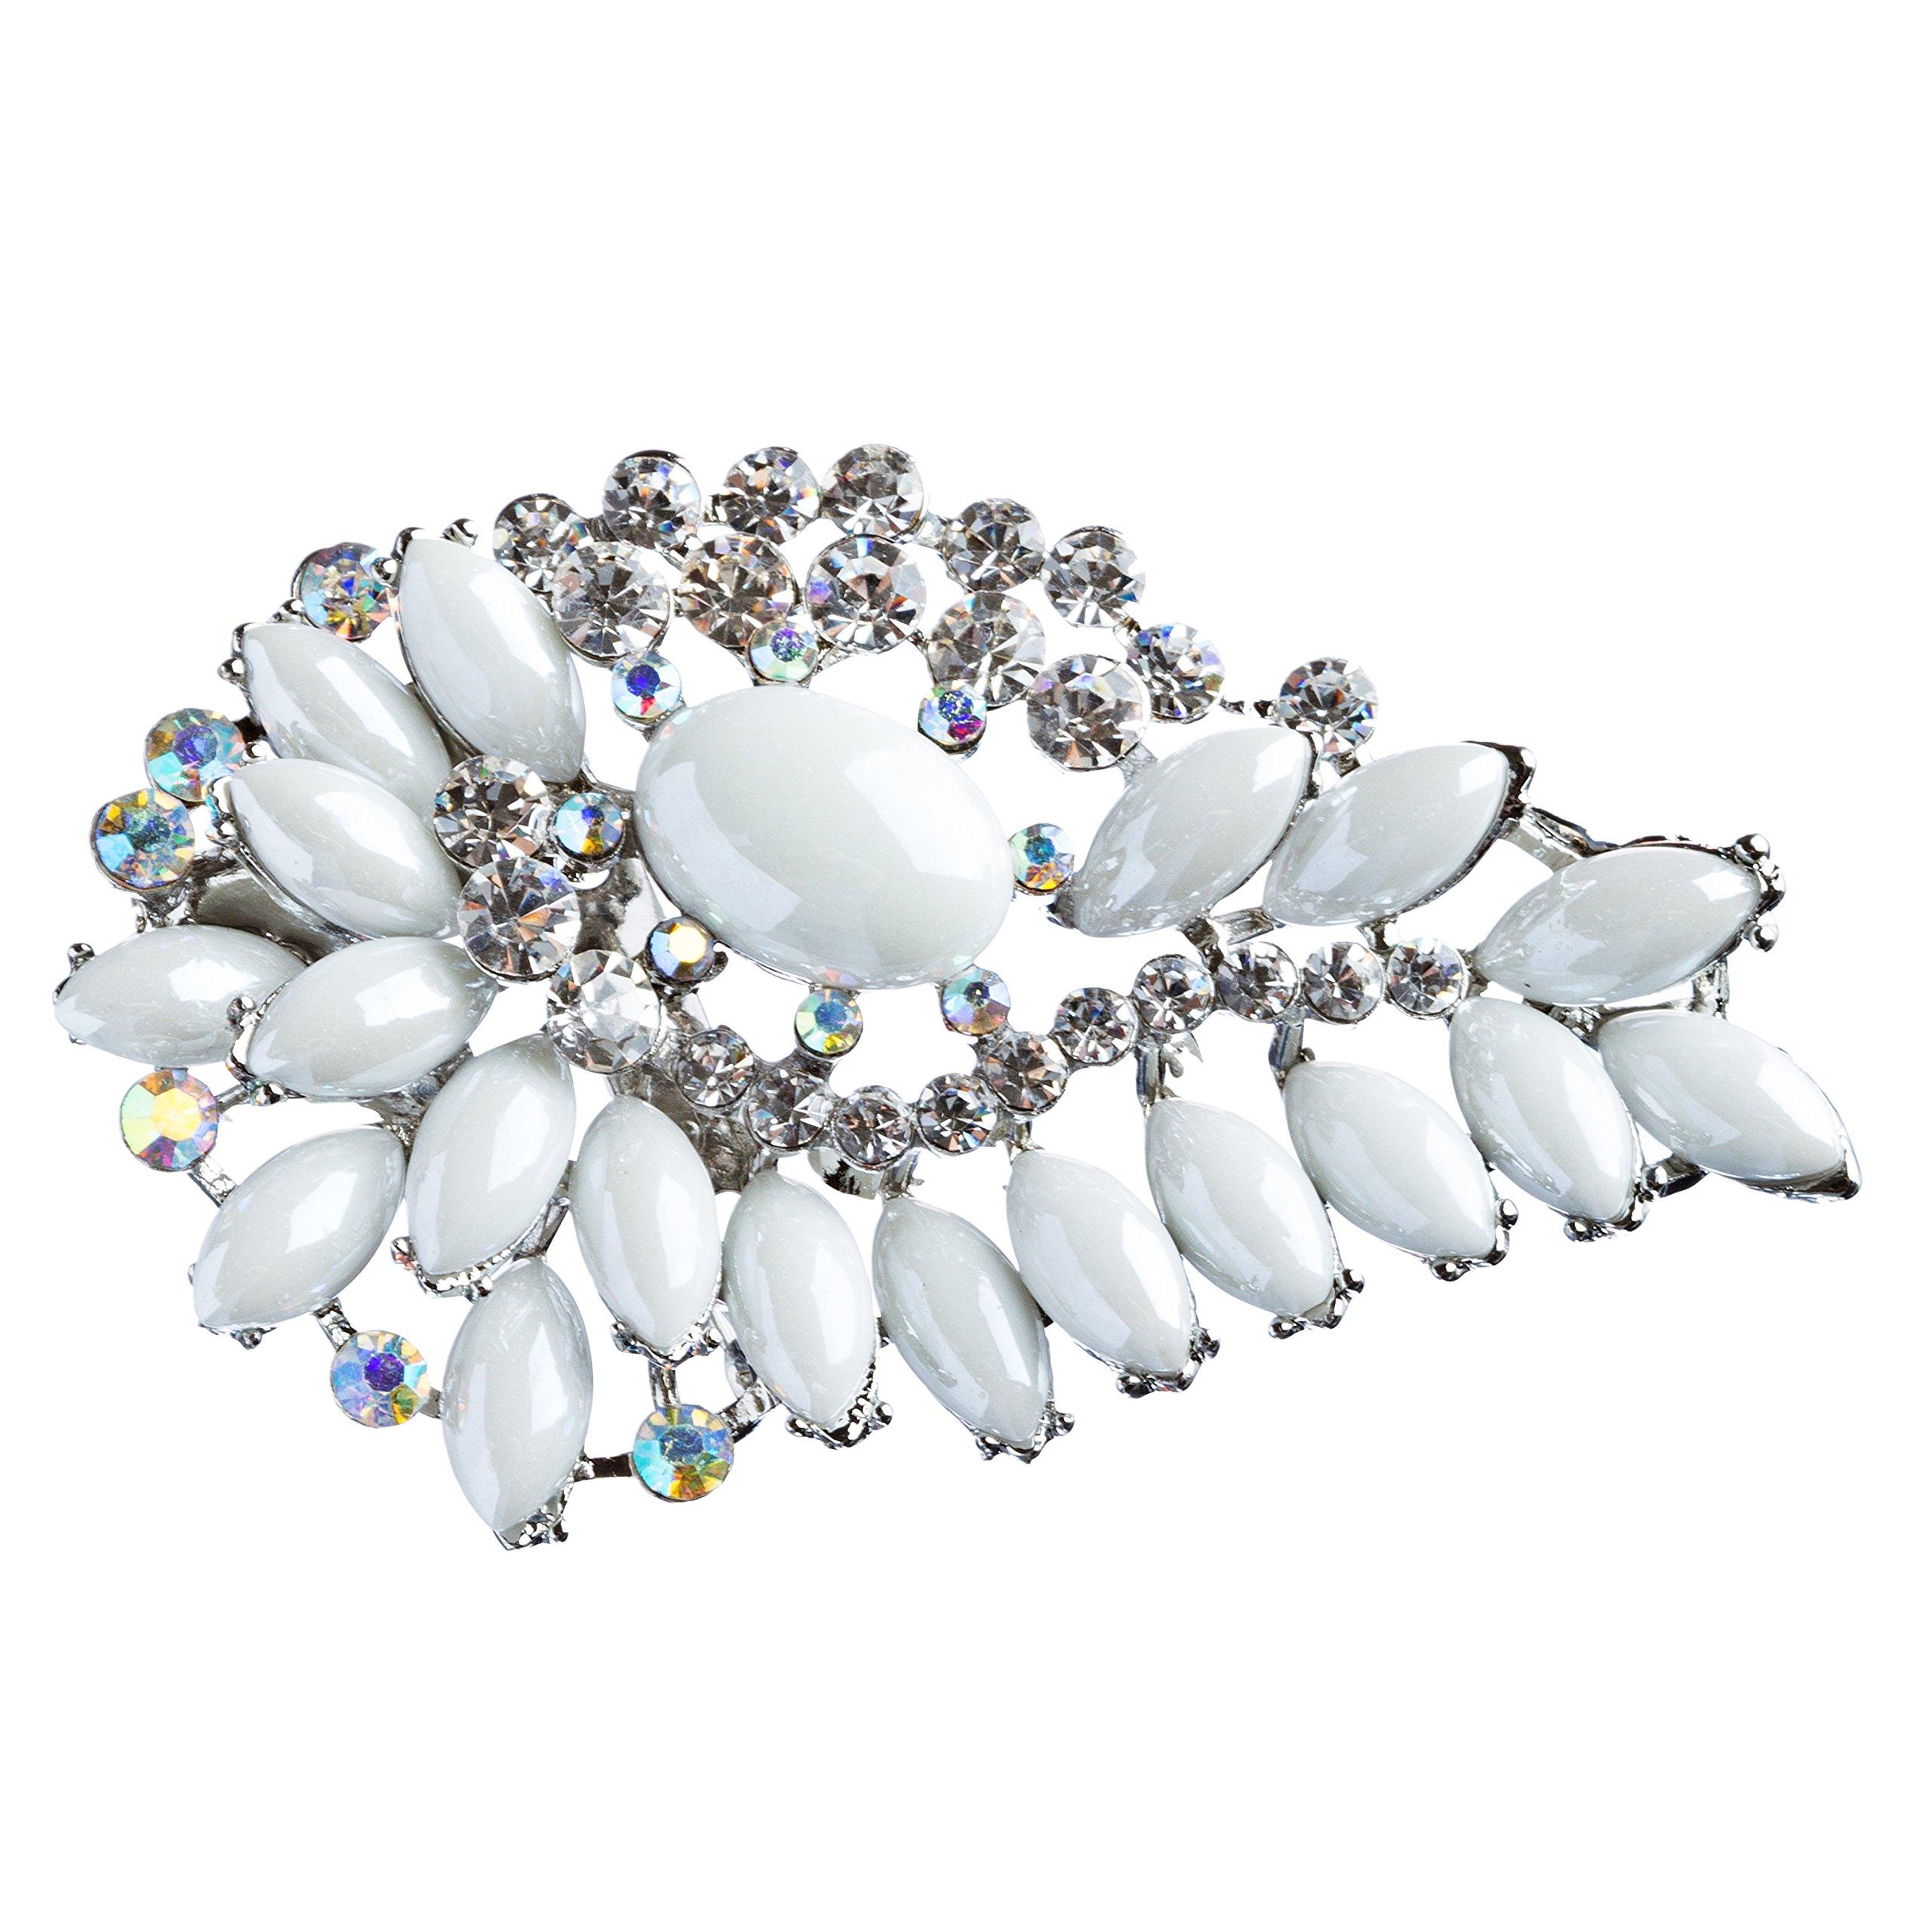 ACCESSORIESFOREVER Women Bridal Wedding Jewelry Crystal Rhinestone Gorgeous Brooch Pin BH175 Silver